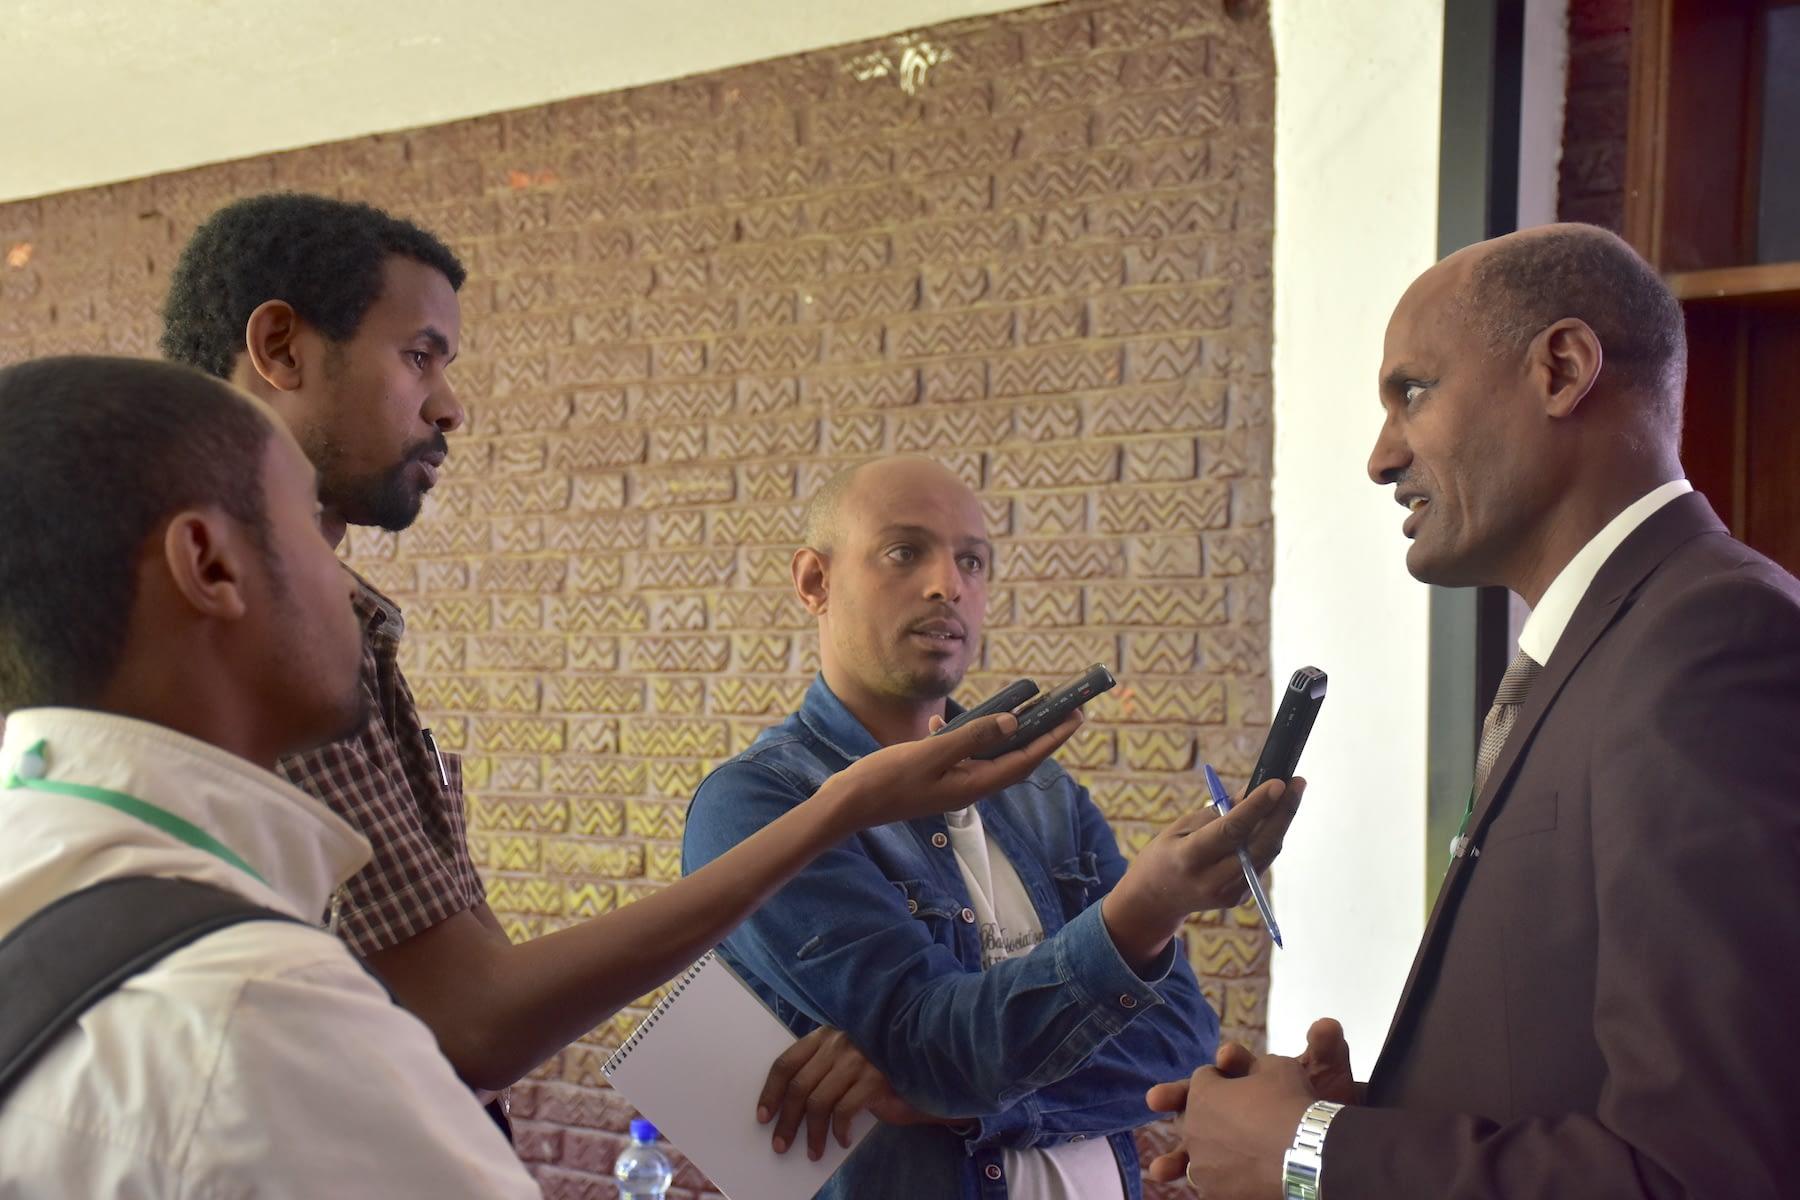 CIMMYT's representative in Ethiopia, Bekele Abeyo, gives an interview for Ethiopian media. (Photo: Jérôme Bossuet/CIMMYT)